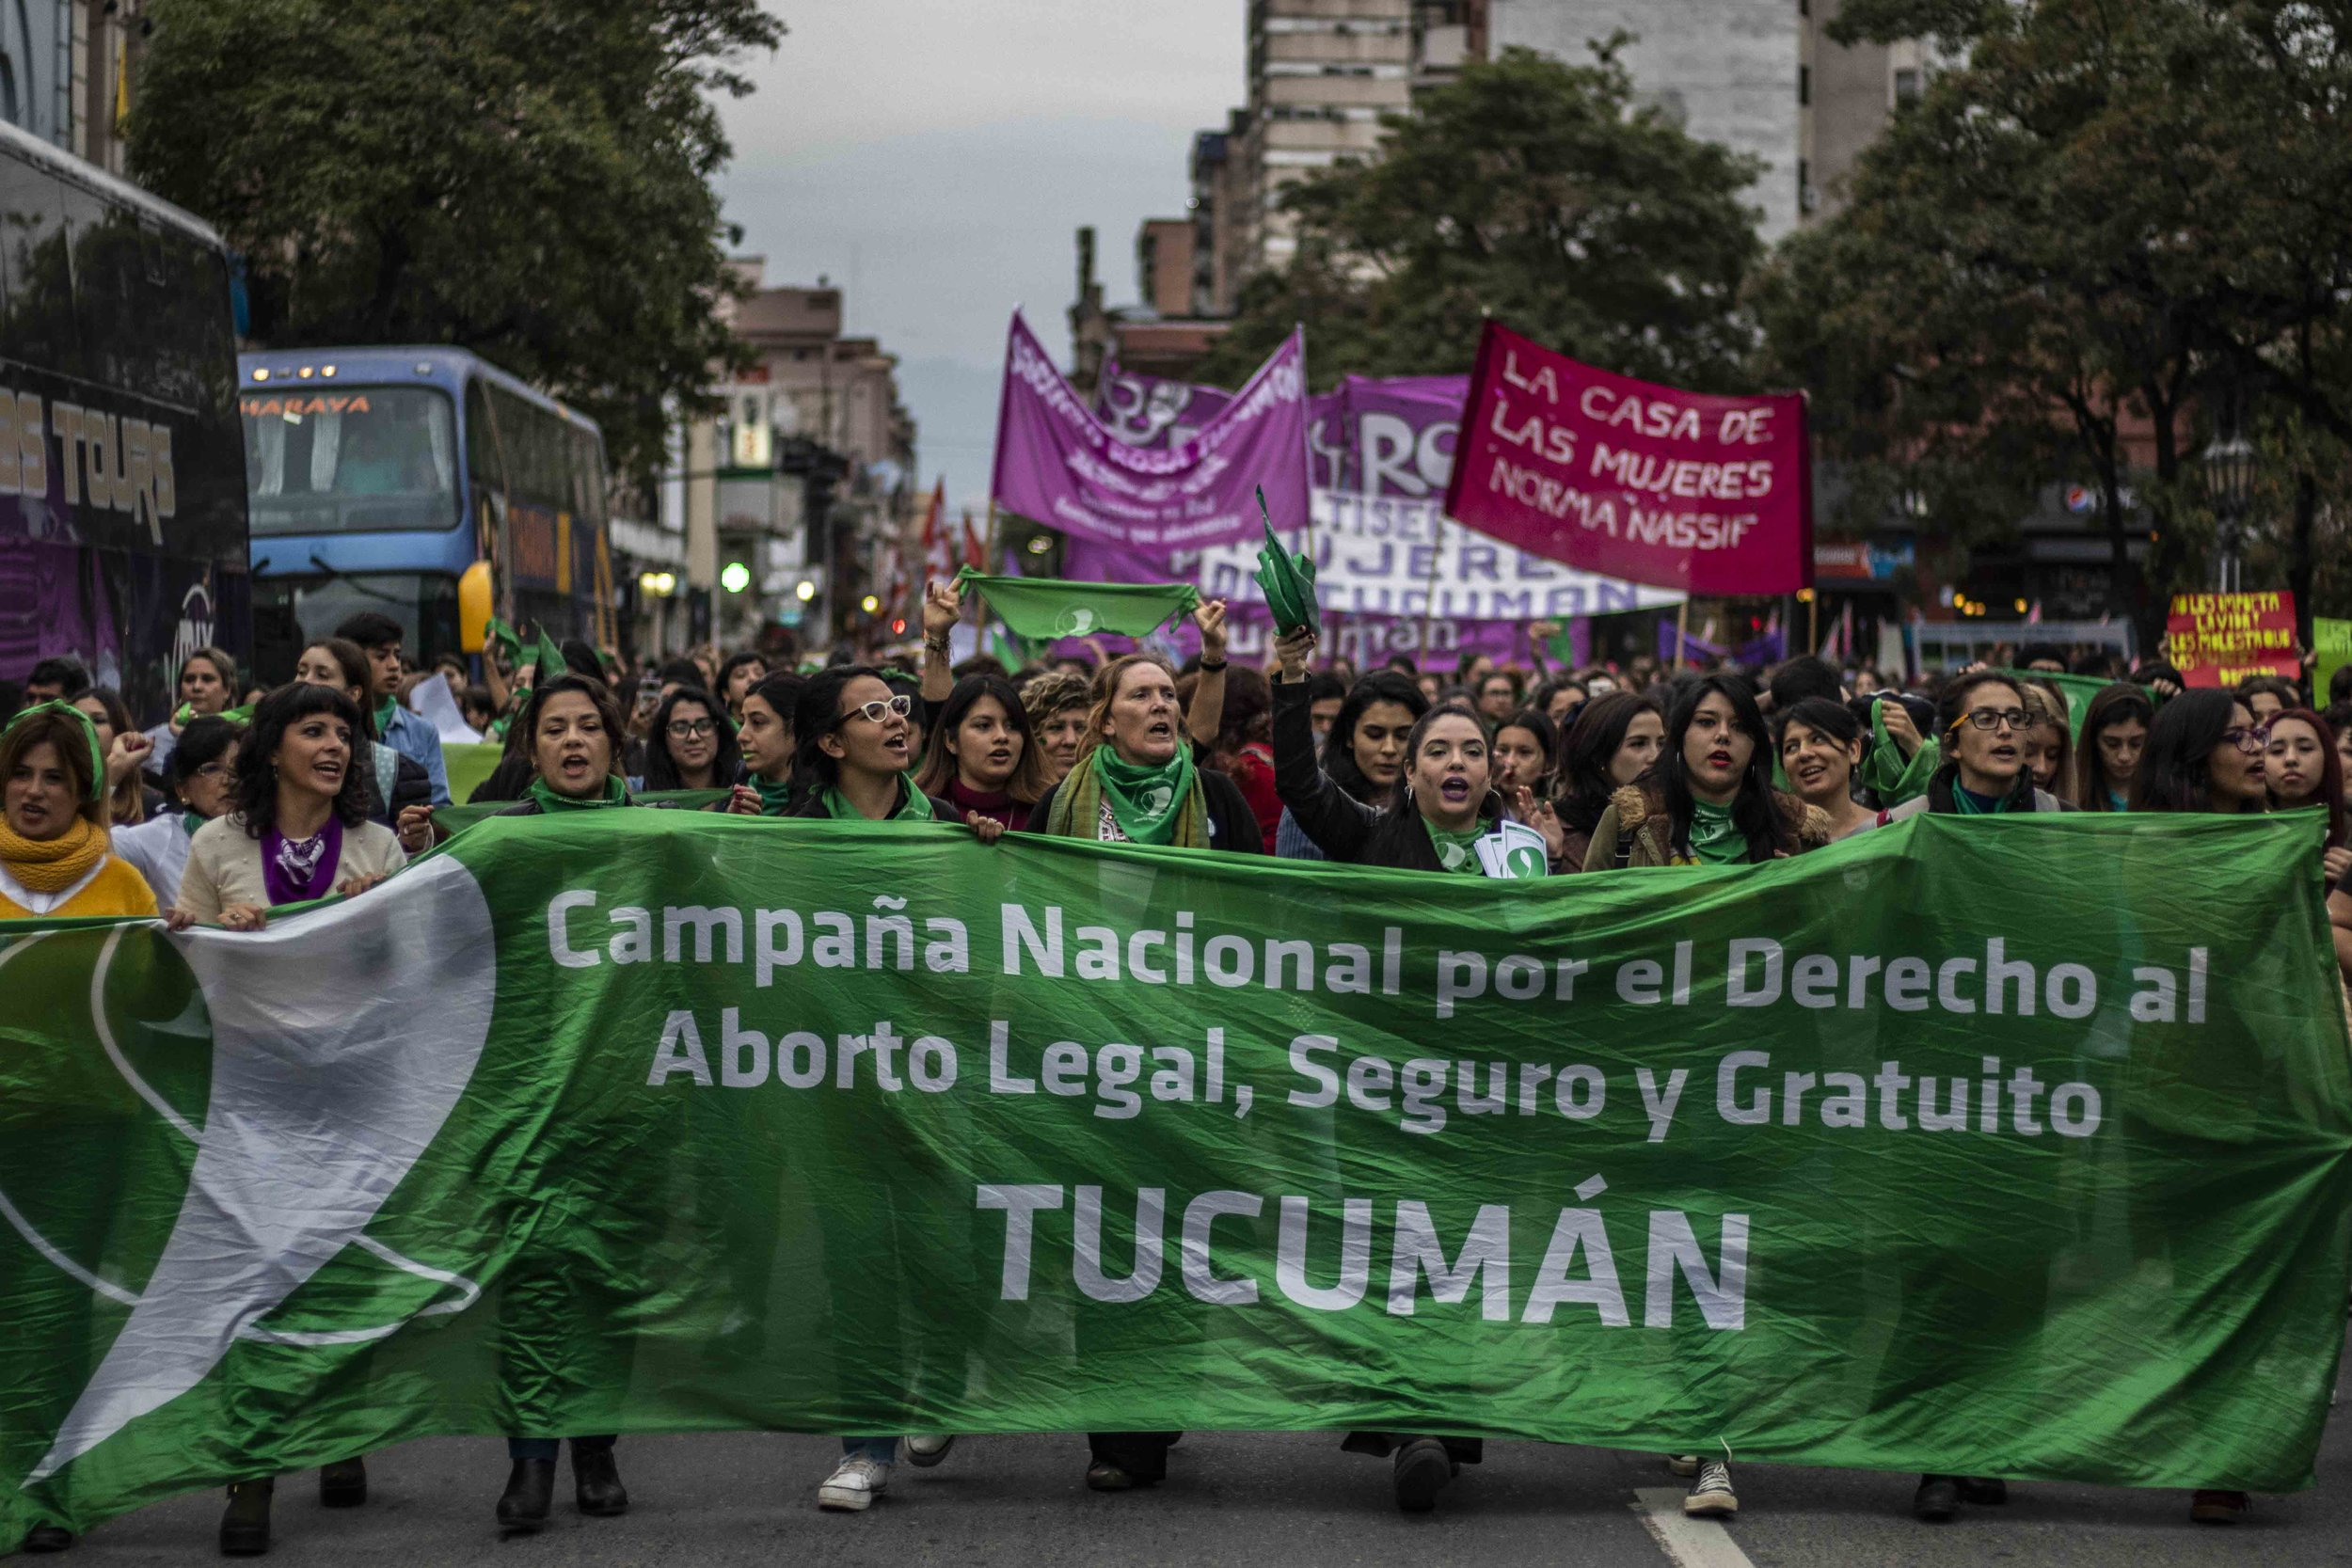 190528-pañuelazo-ley-aborto-tucumán-la-palta-ignacio-lopez-isasmendi17.JPG